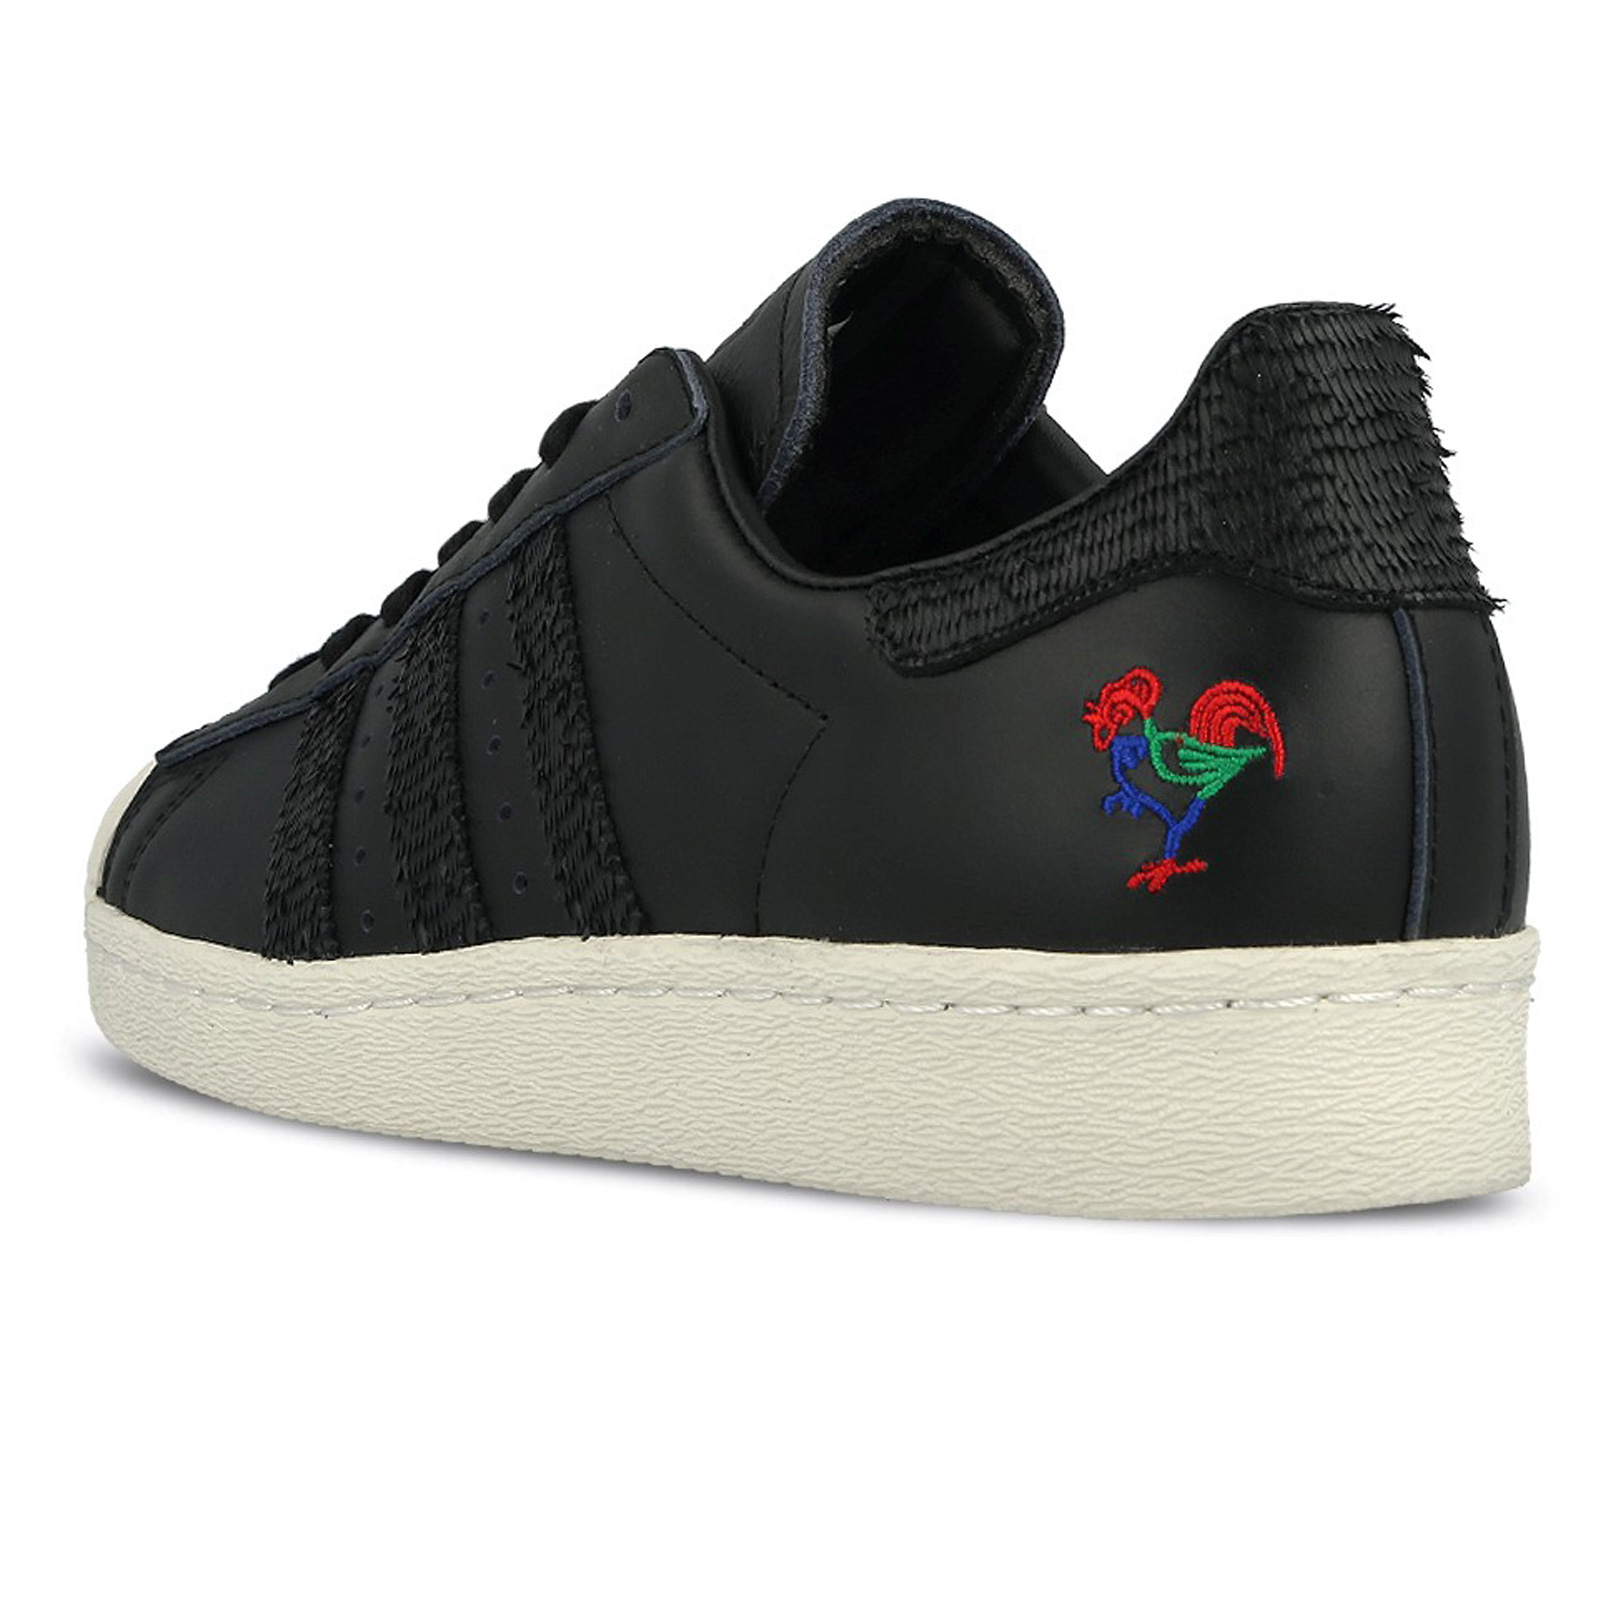 Détails sur Adidas Superstar 80s Cny Chinoise Neuf Year Baskets Lim. Édition Noir BA7778